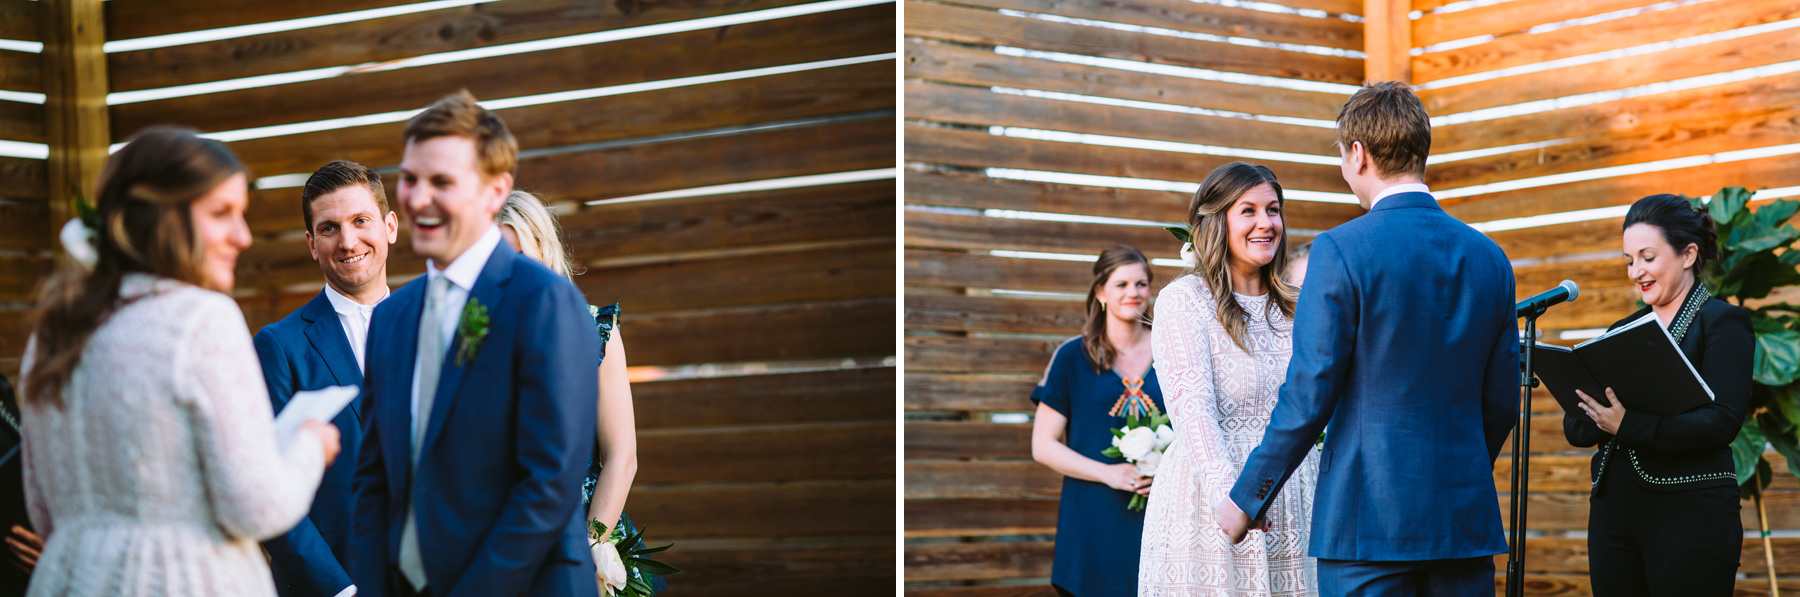 Pete + Susannah The Guild Kansas City Bohemian Outdoor Wedding _Kindling Wedding Photography - 47.JPG